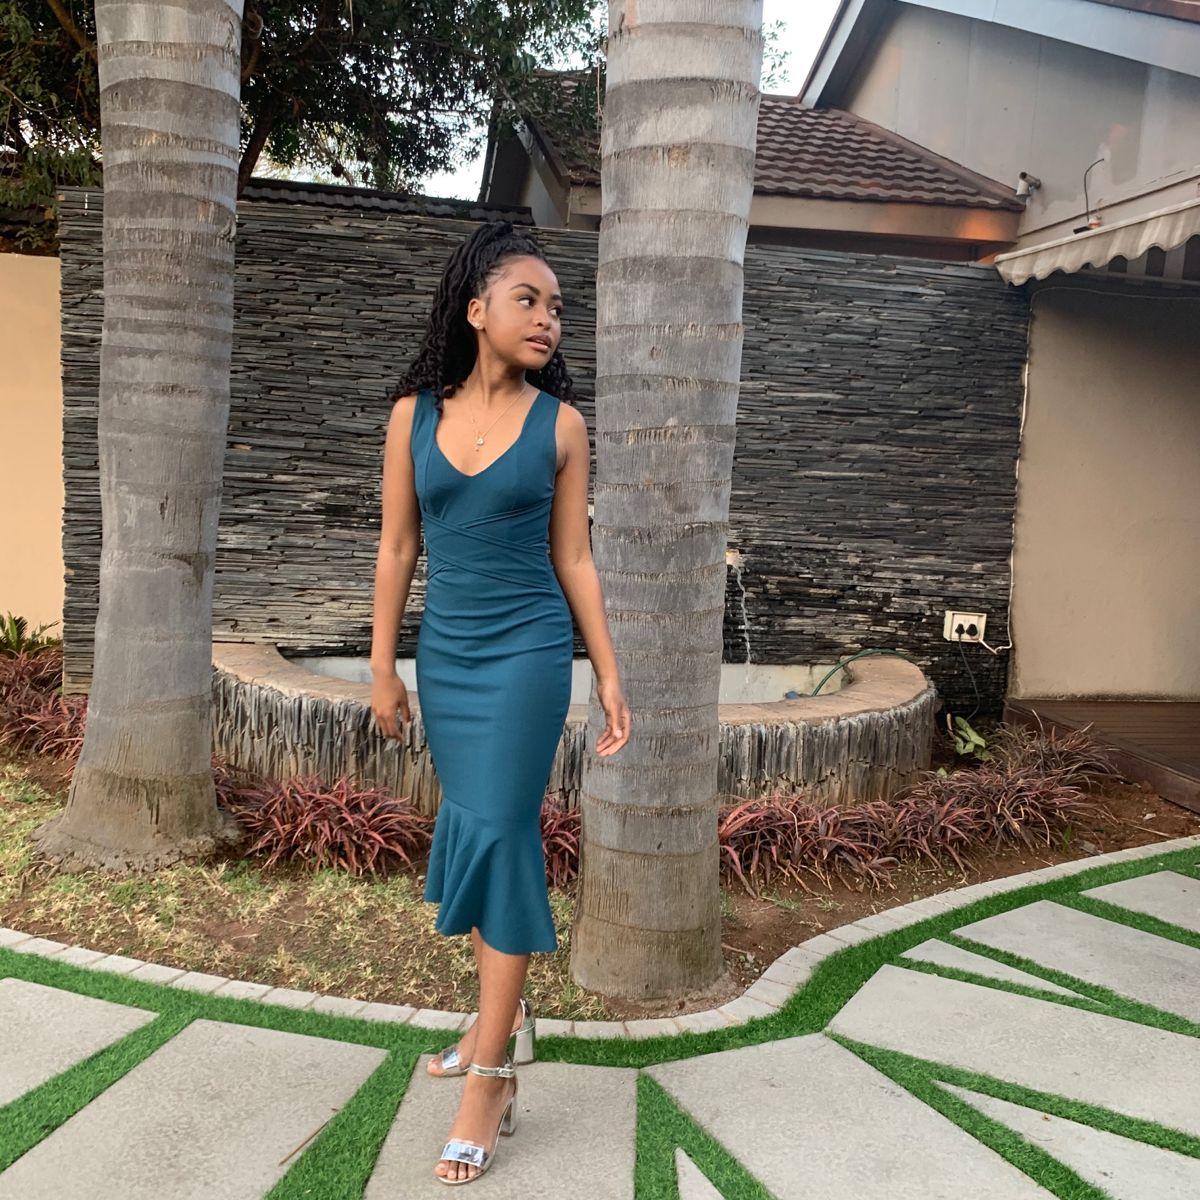 Black Girl In Turquoise Dress Turquoise Dress Black Girl Dresses [ 1200 x 1200 Pixel ]